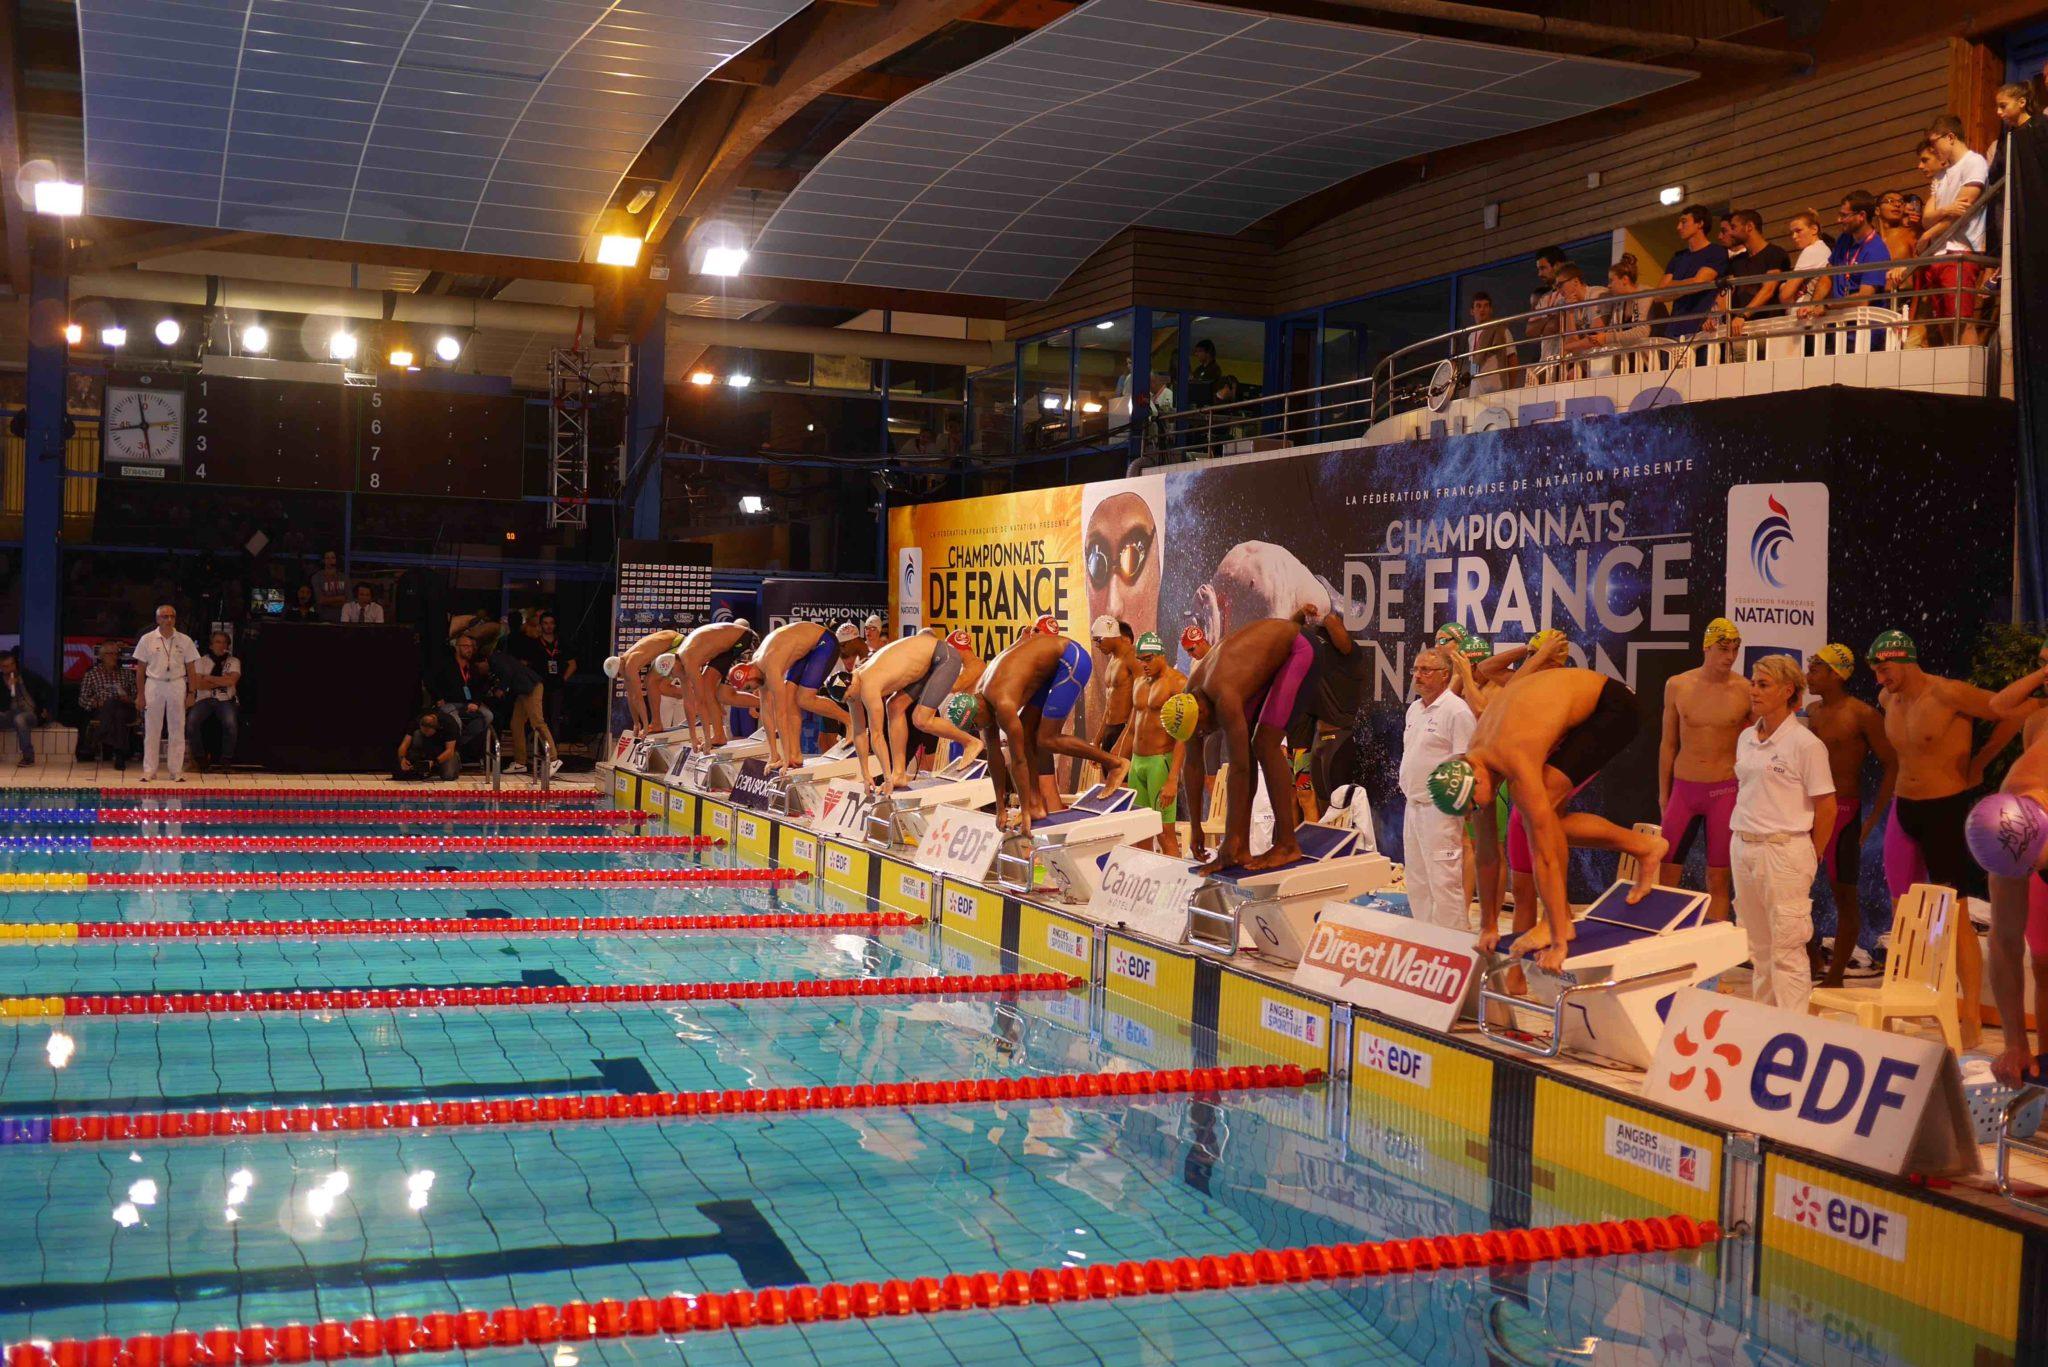 championnats-france-natation-2016-angers-1